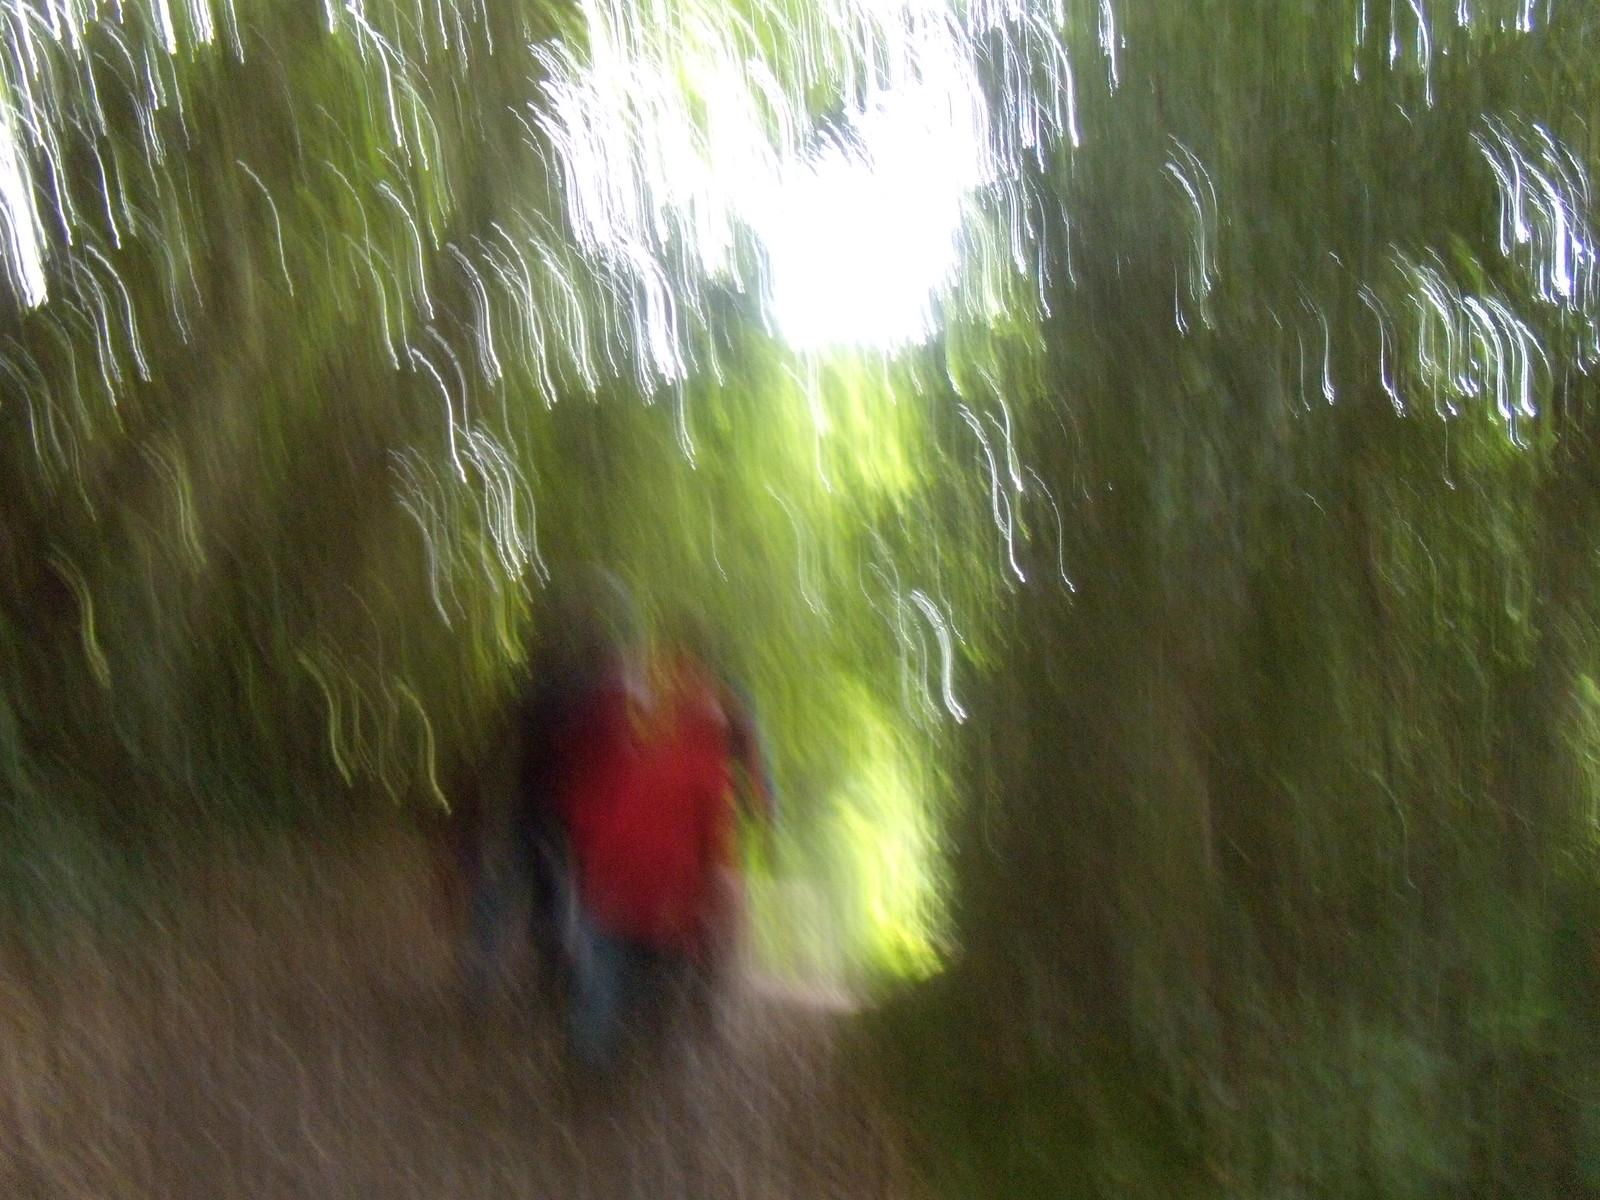 Blurred folk Ashurst to Hartfield